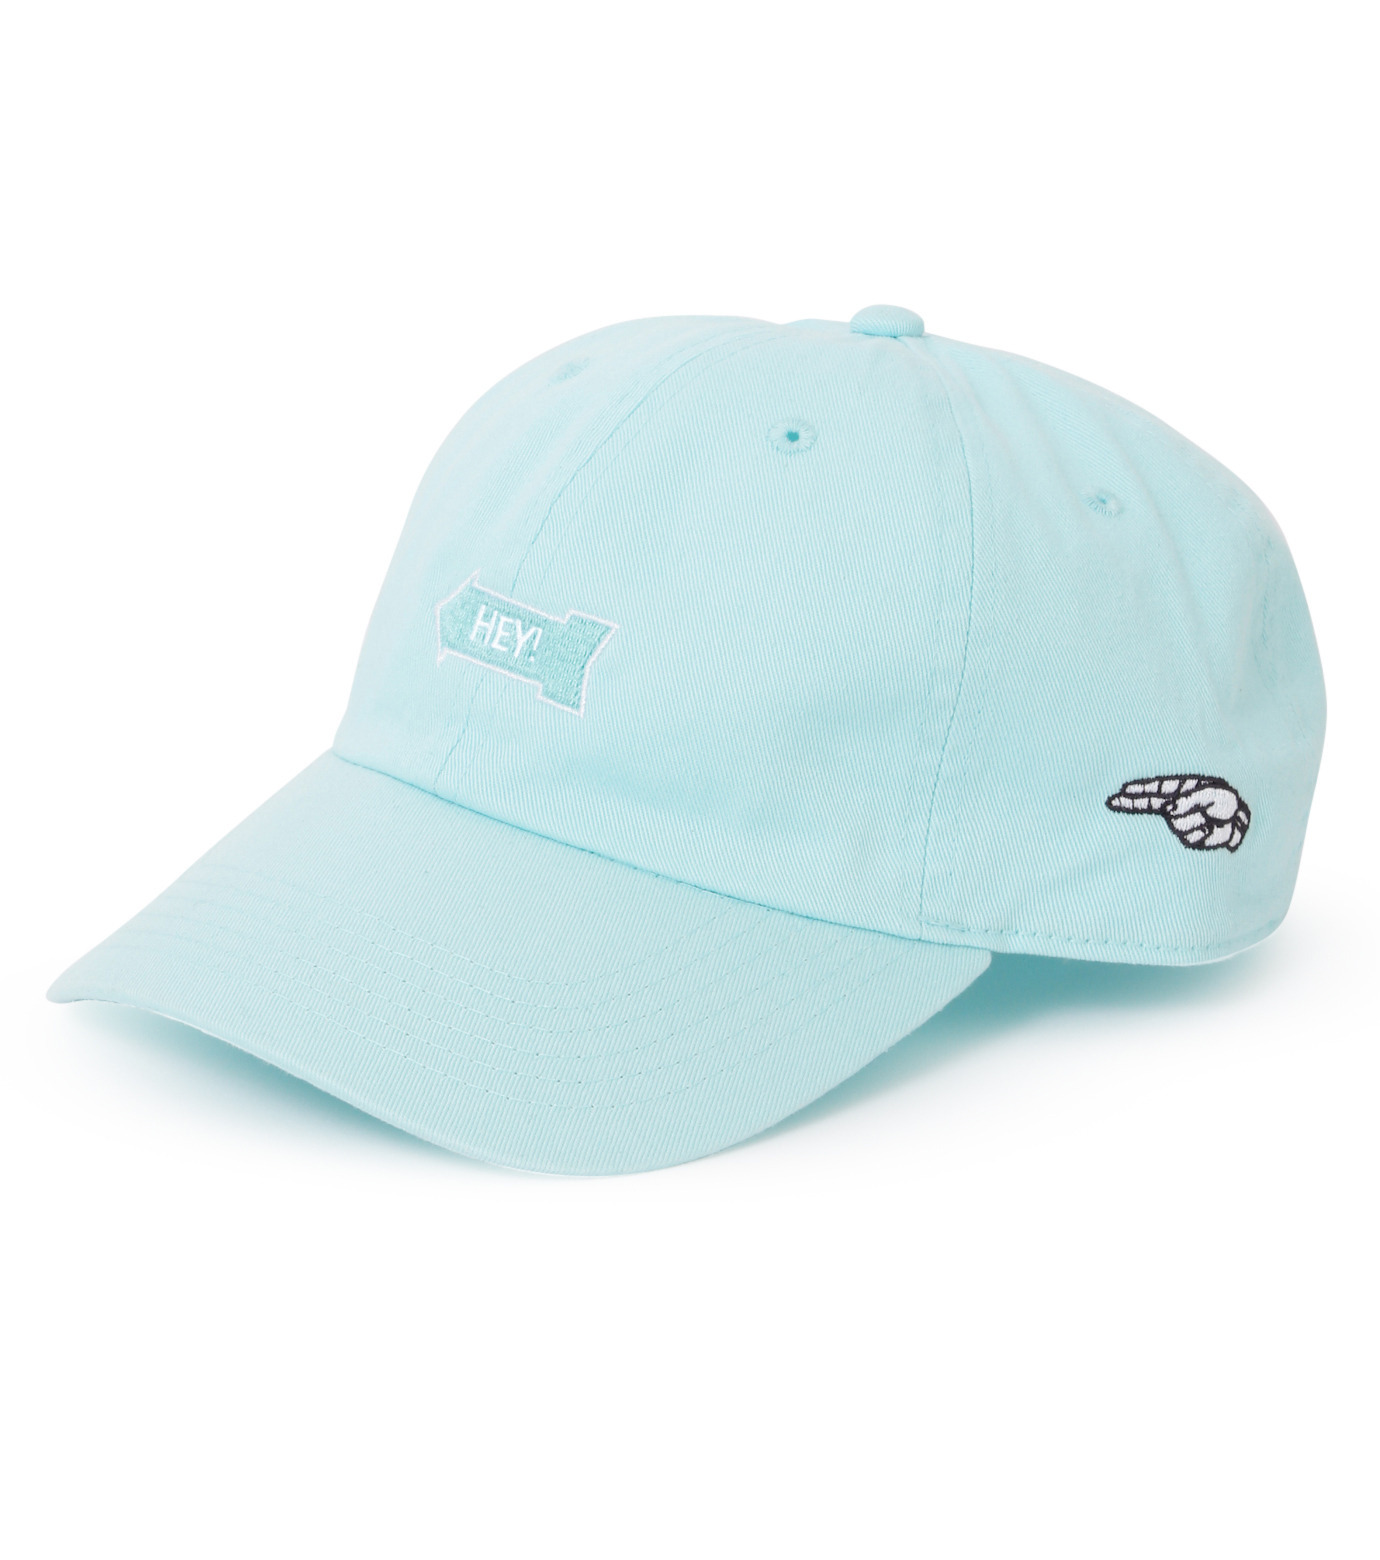 HEY YOU !(ヘイユウ)のHEY! CAP-LIGHT BLUE(キャップ/cap)-18S90020-91 拡大詳細画像1